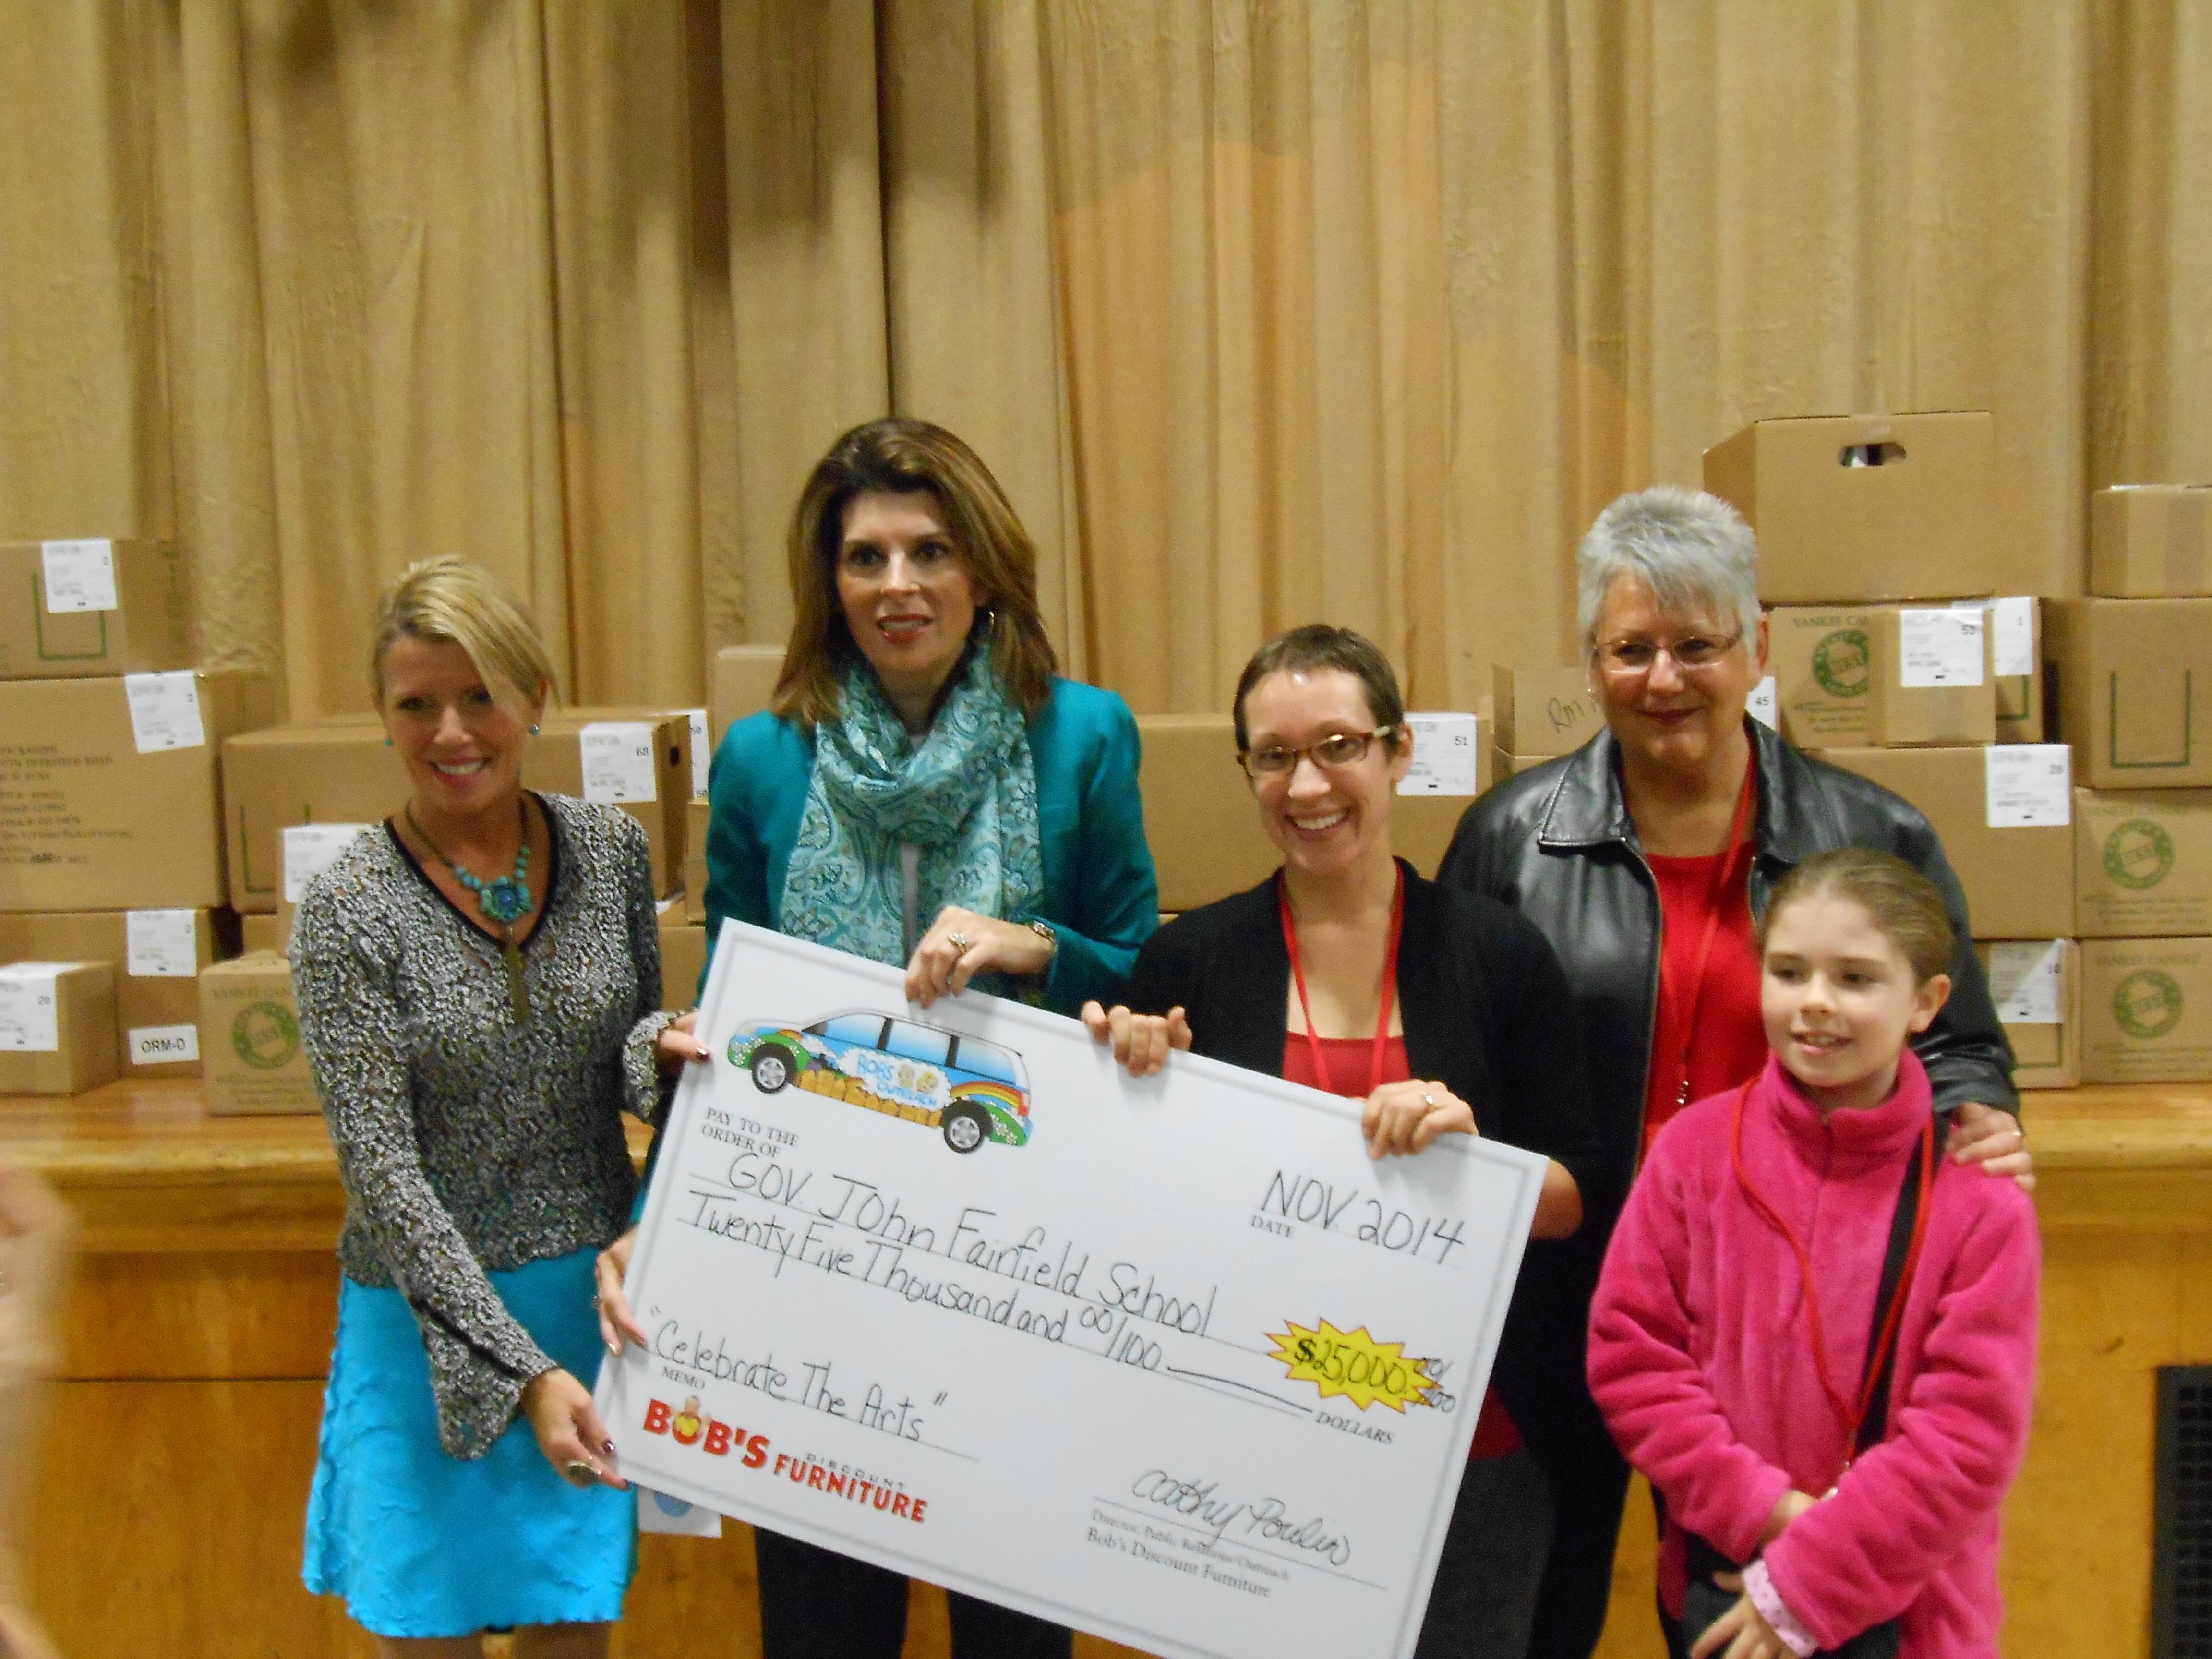 Bob S Discount Furniture Awards 25 000 To Gov John Fairfield Elementary School Of Saco Maine